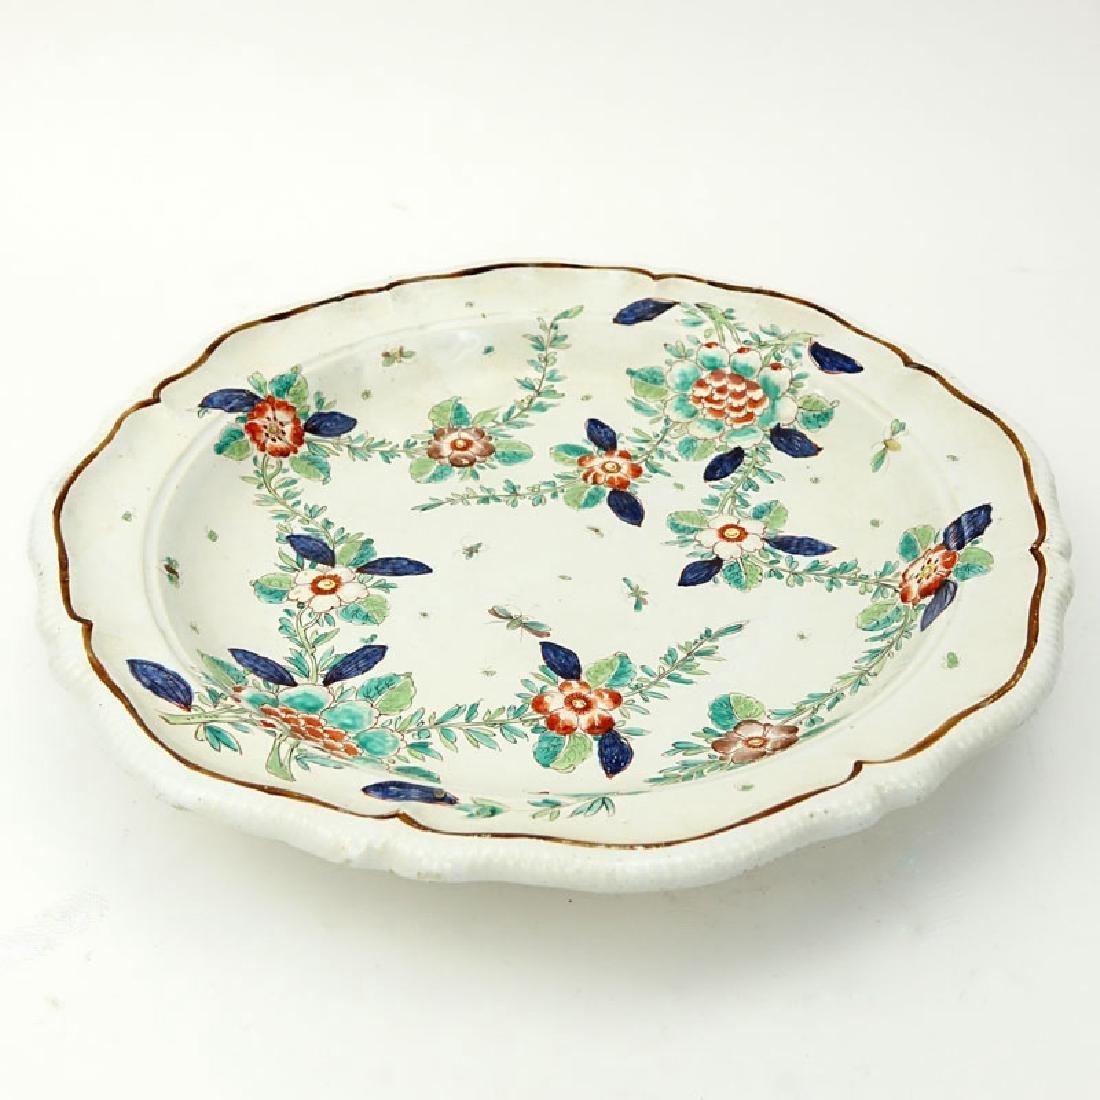 Antique Faience Raised Flower Hand Painted Ceramic